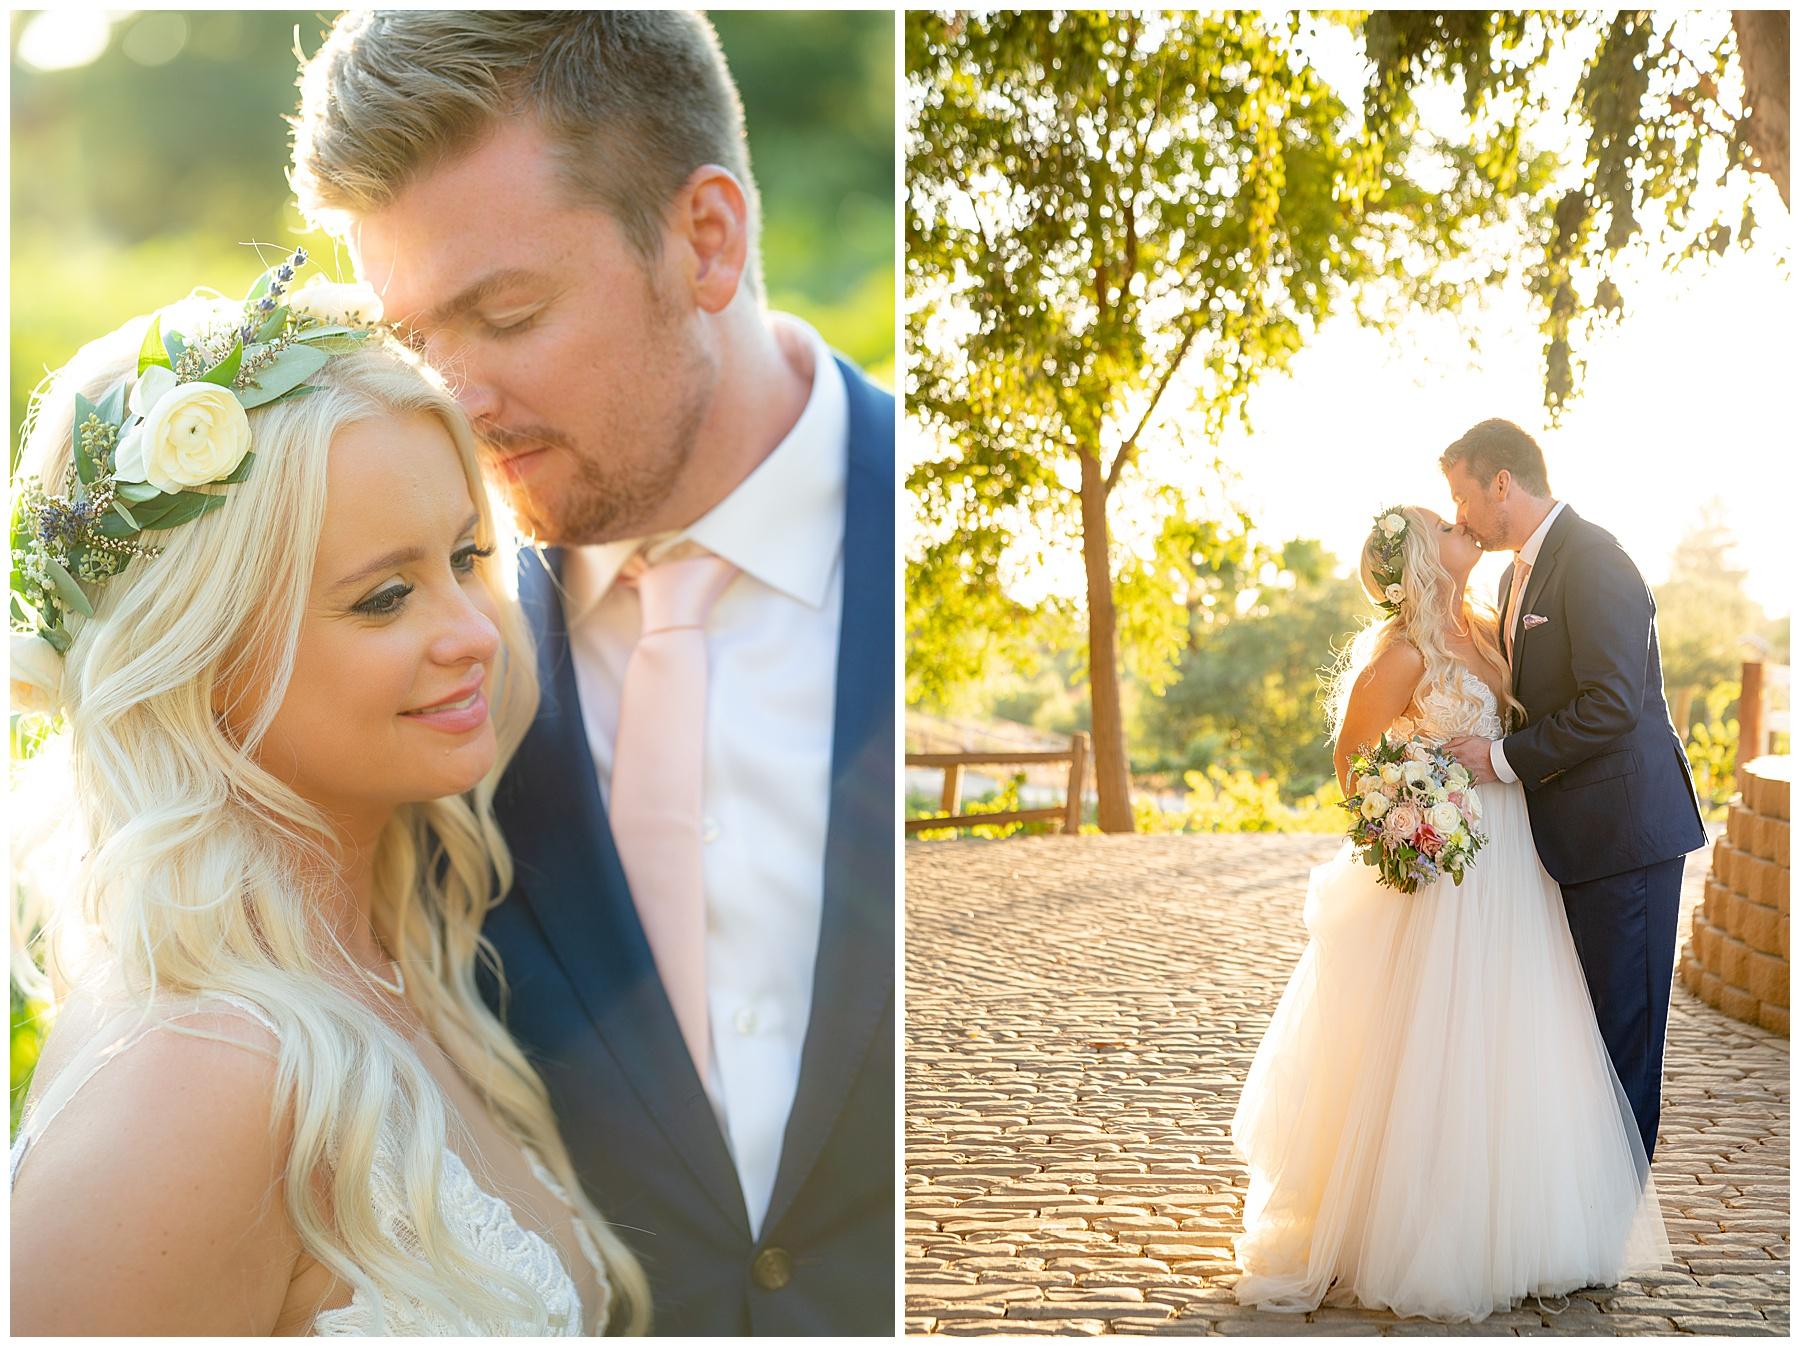 lake oak meadows weddings and events temecula ca